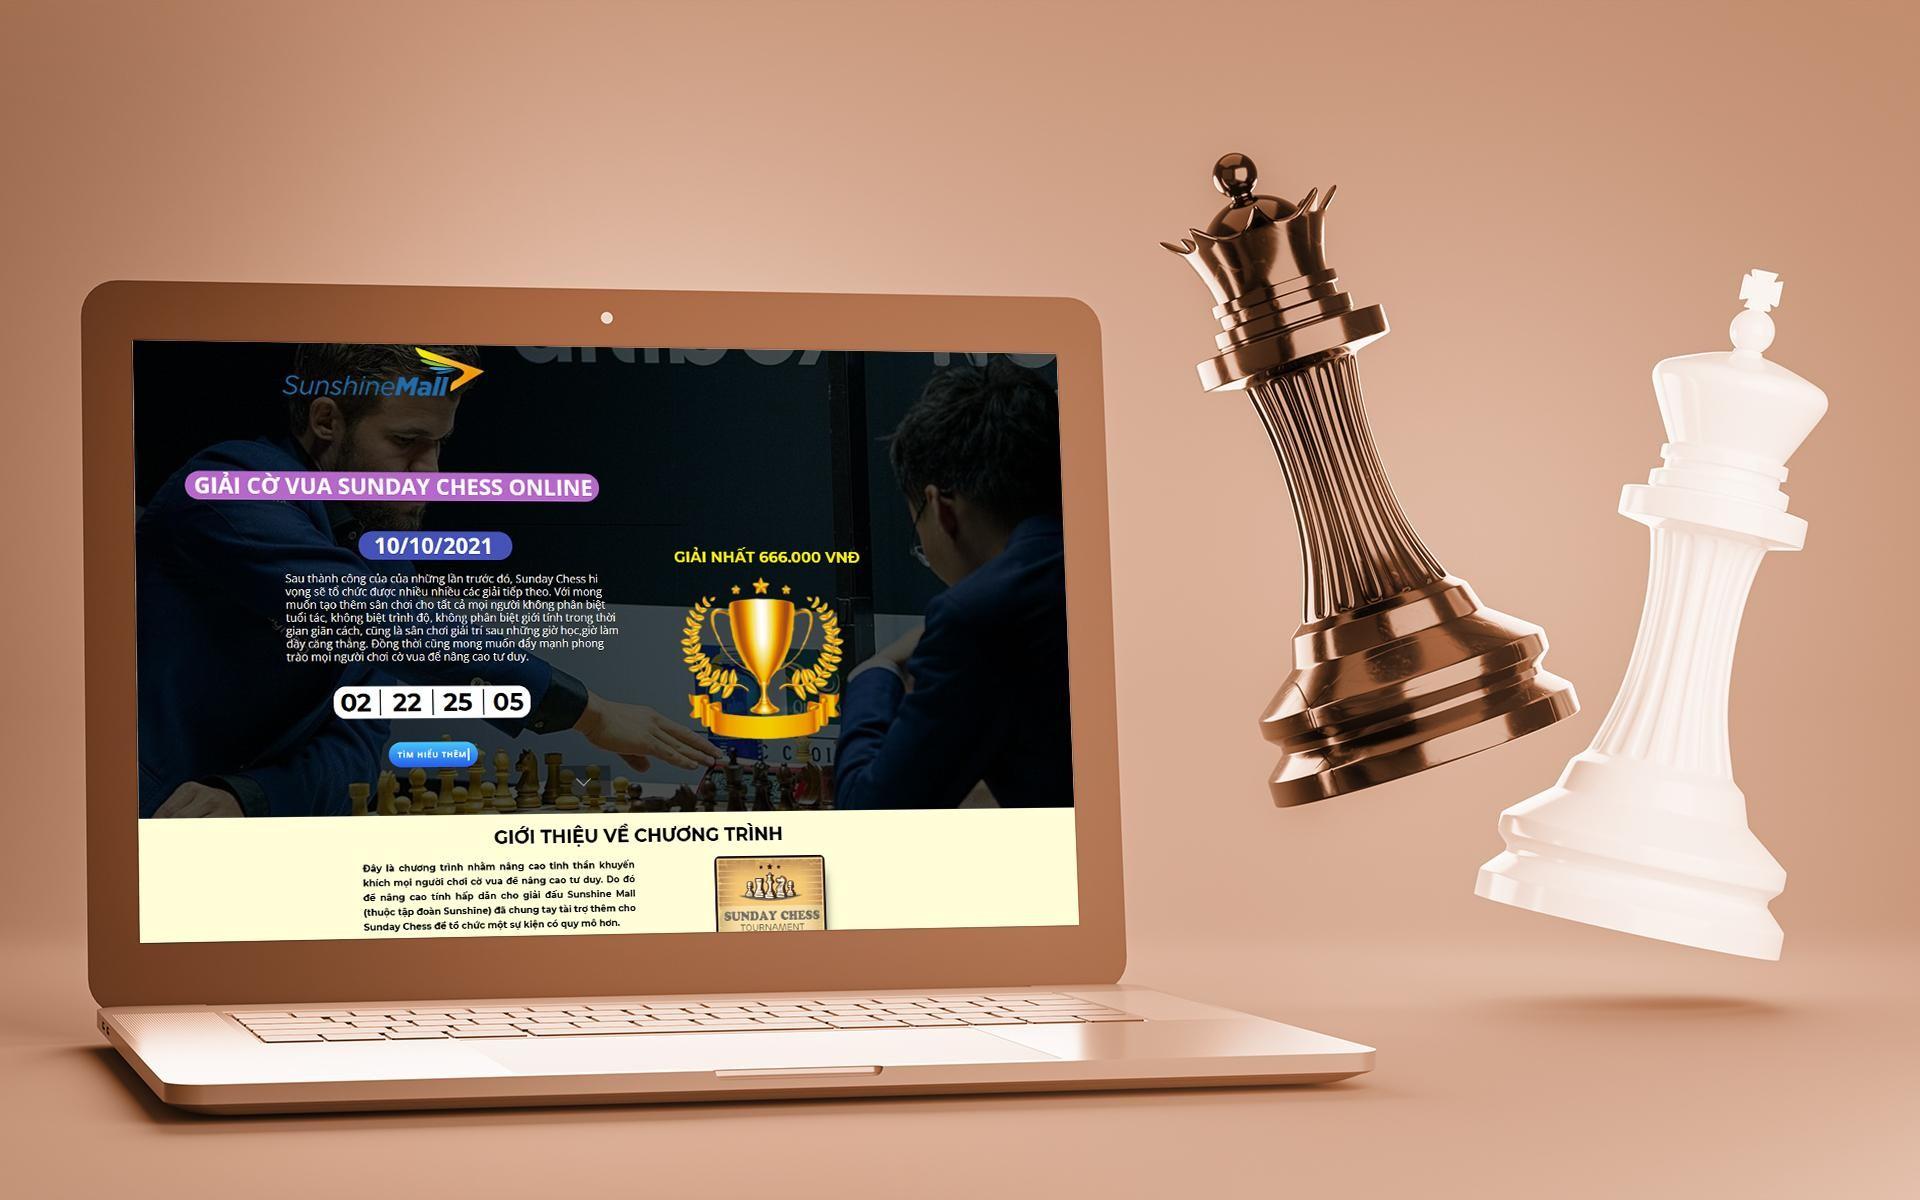 giai-co-vua-sunday-chess-online-3-1633598718.jpg